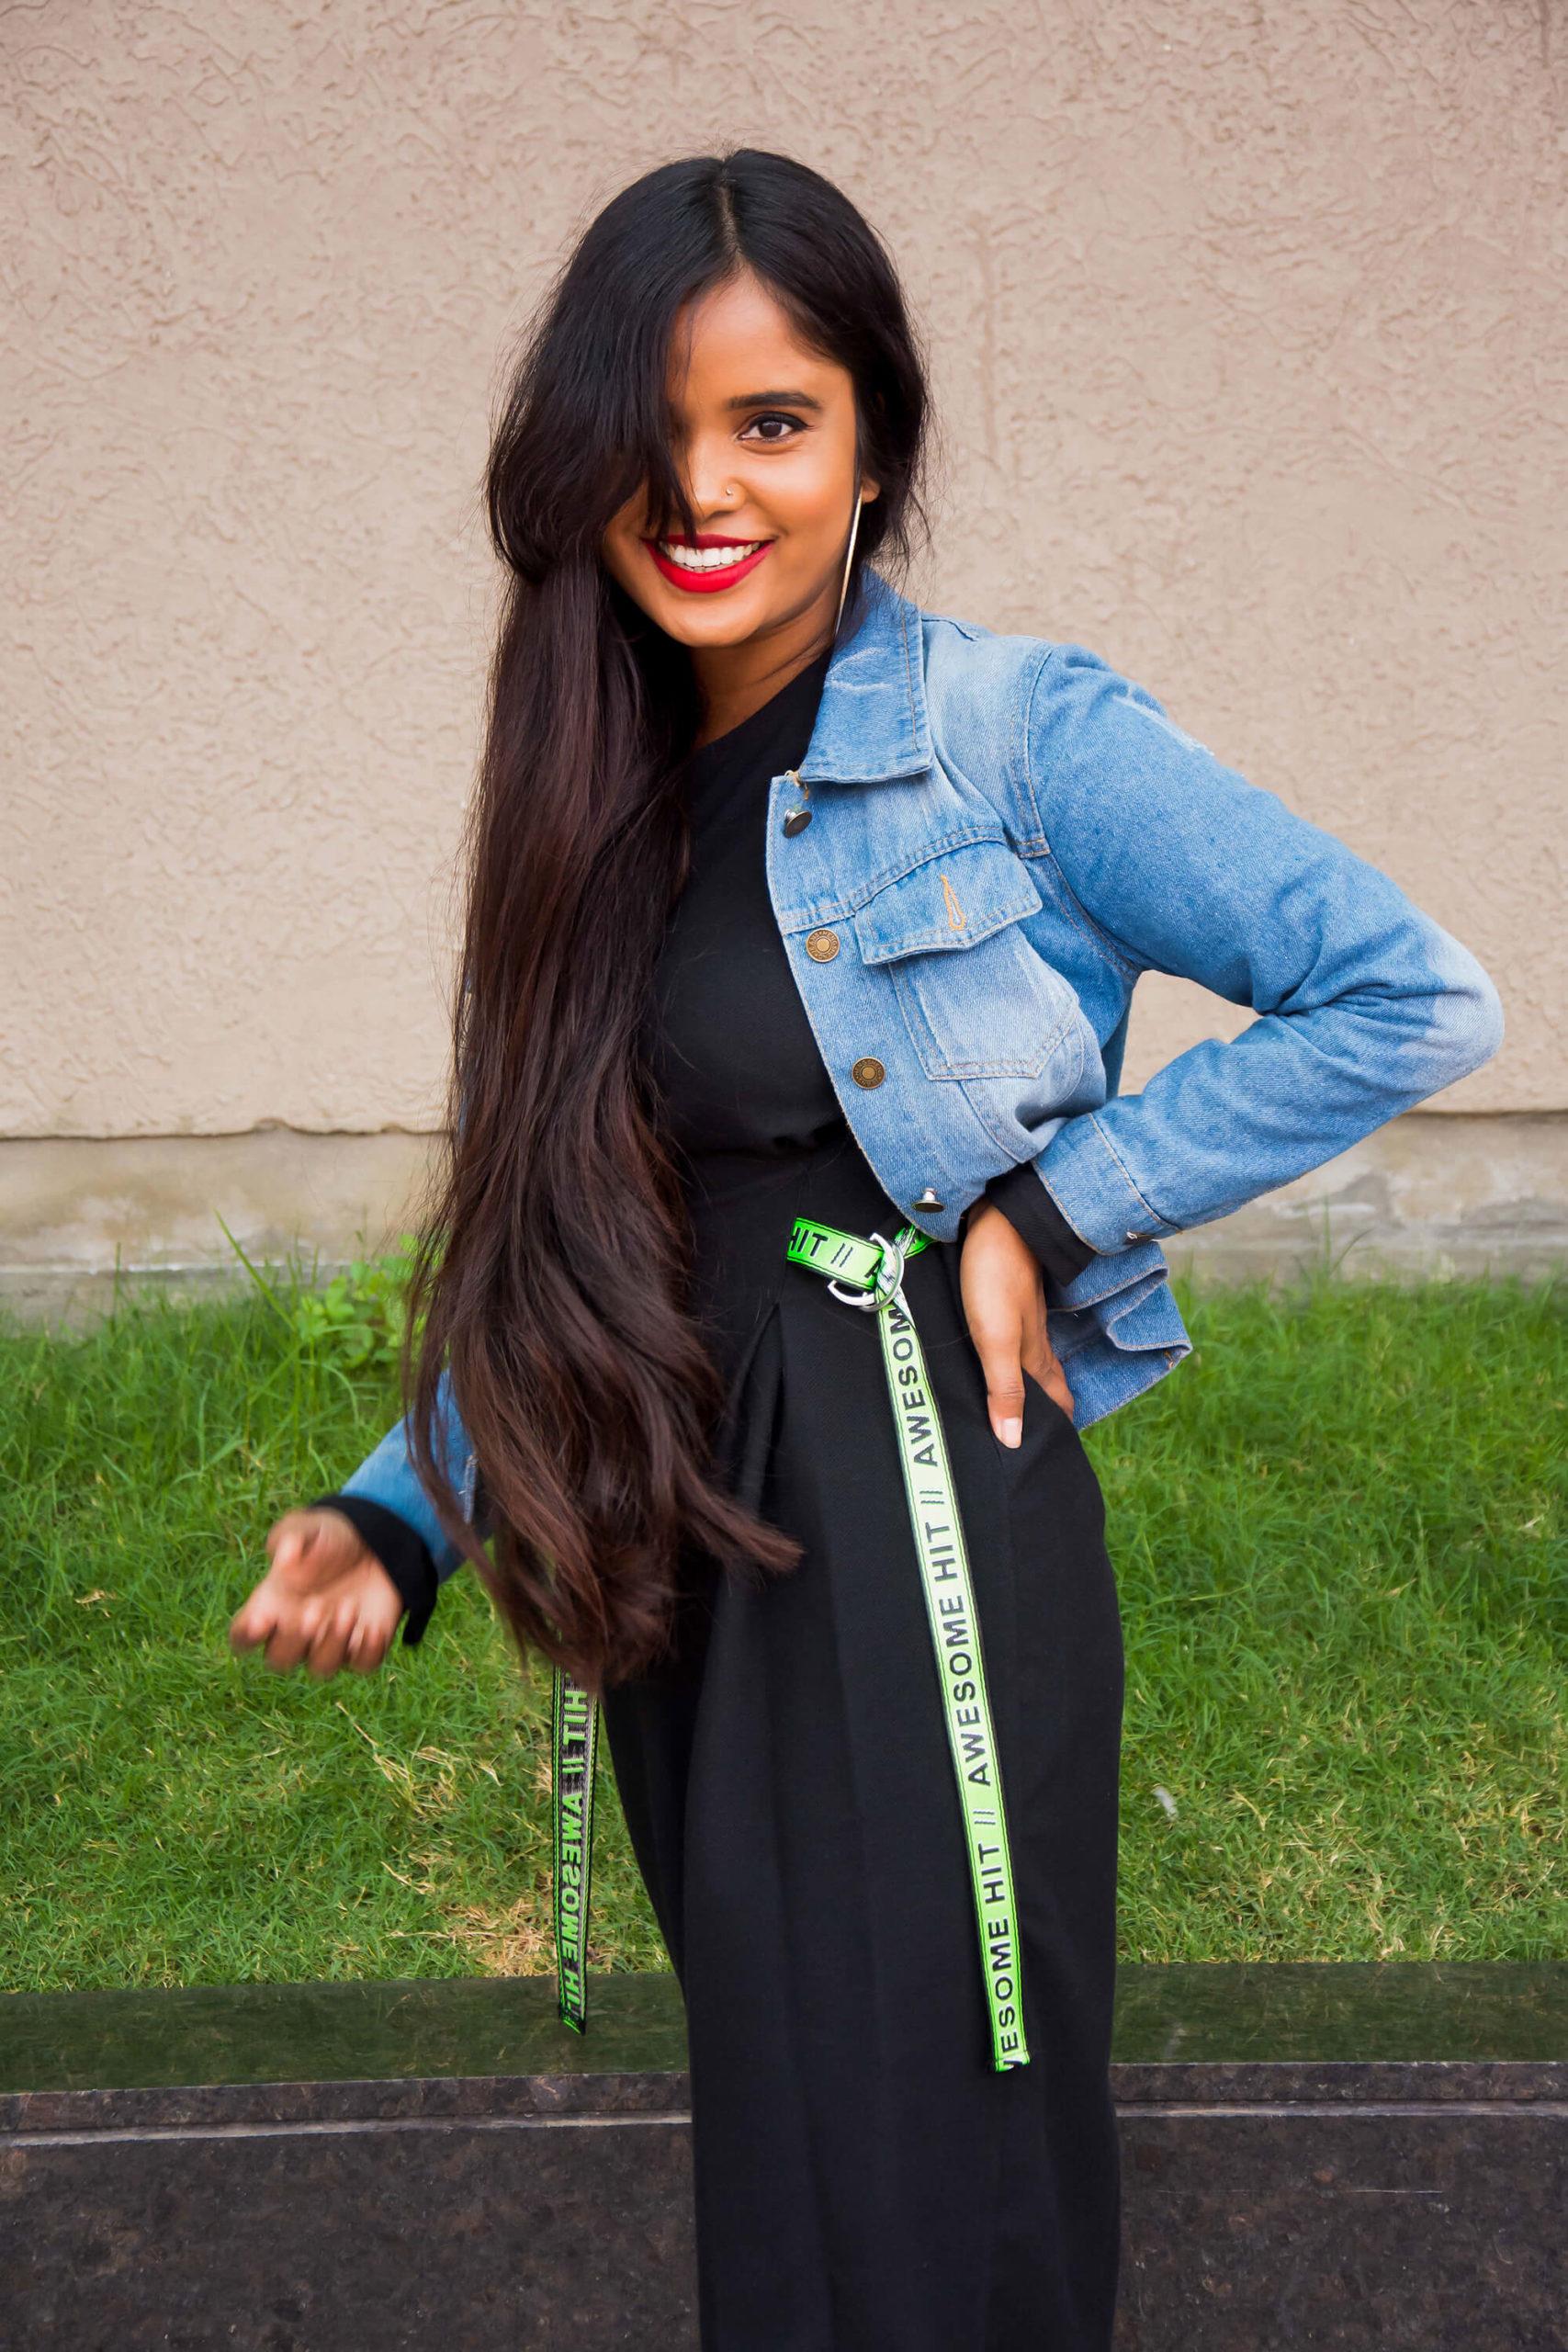 OOTD : Zara outfits